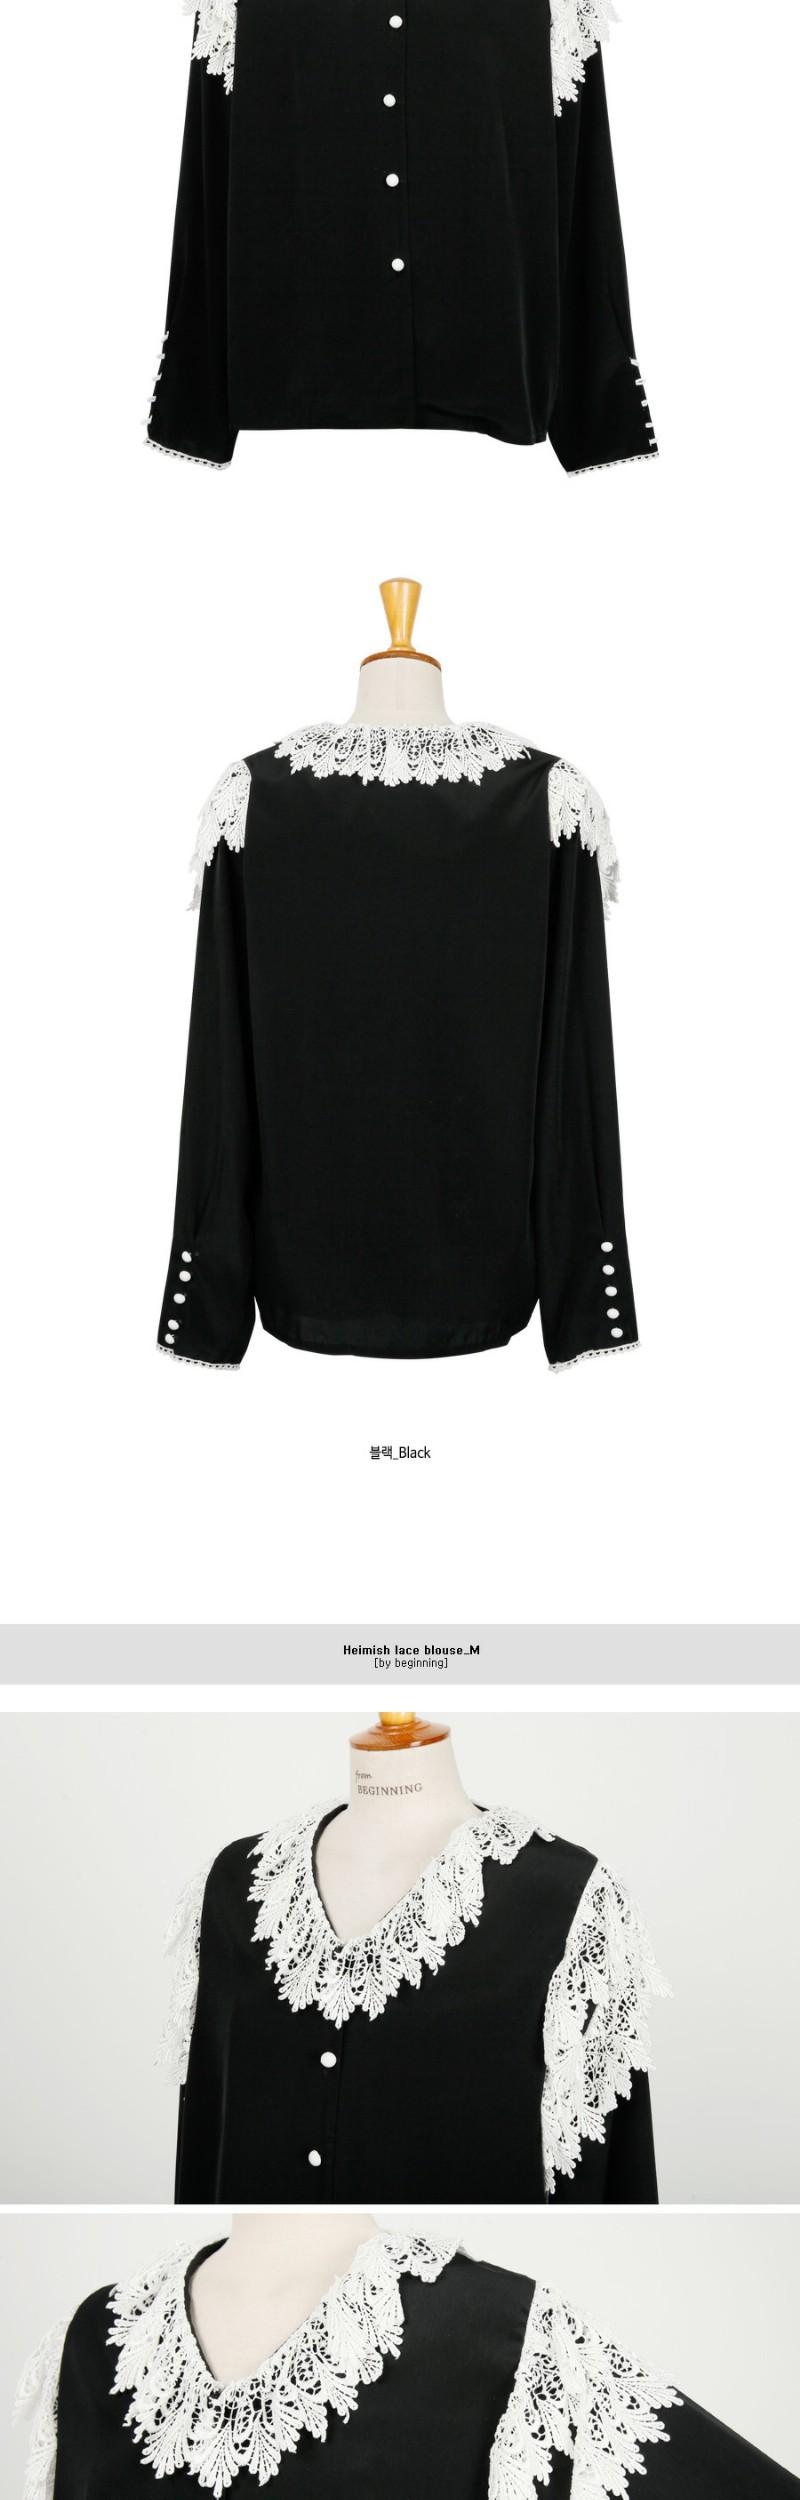 Heimish lace blouse_M (size : free)